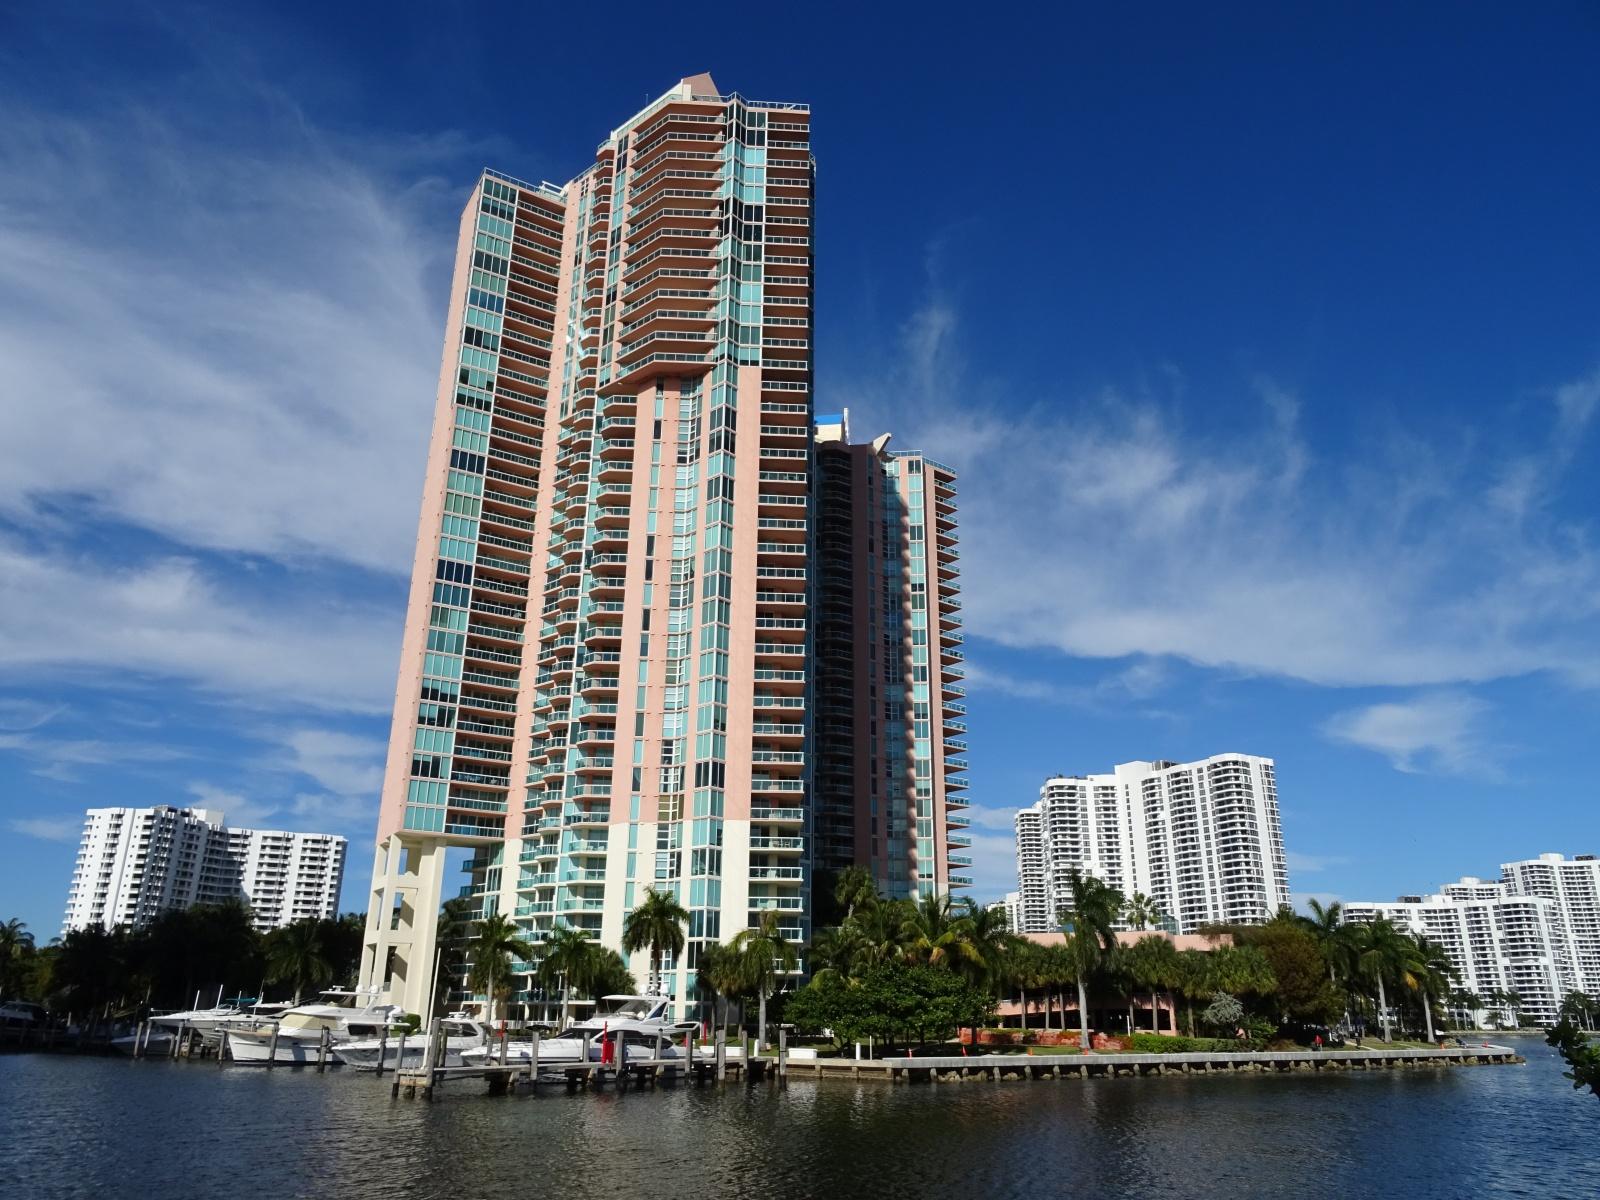 #HiddenBay, 3370 Hidden Bay Dr, #Aventura, Florida, 33180